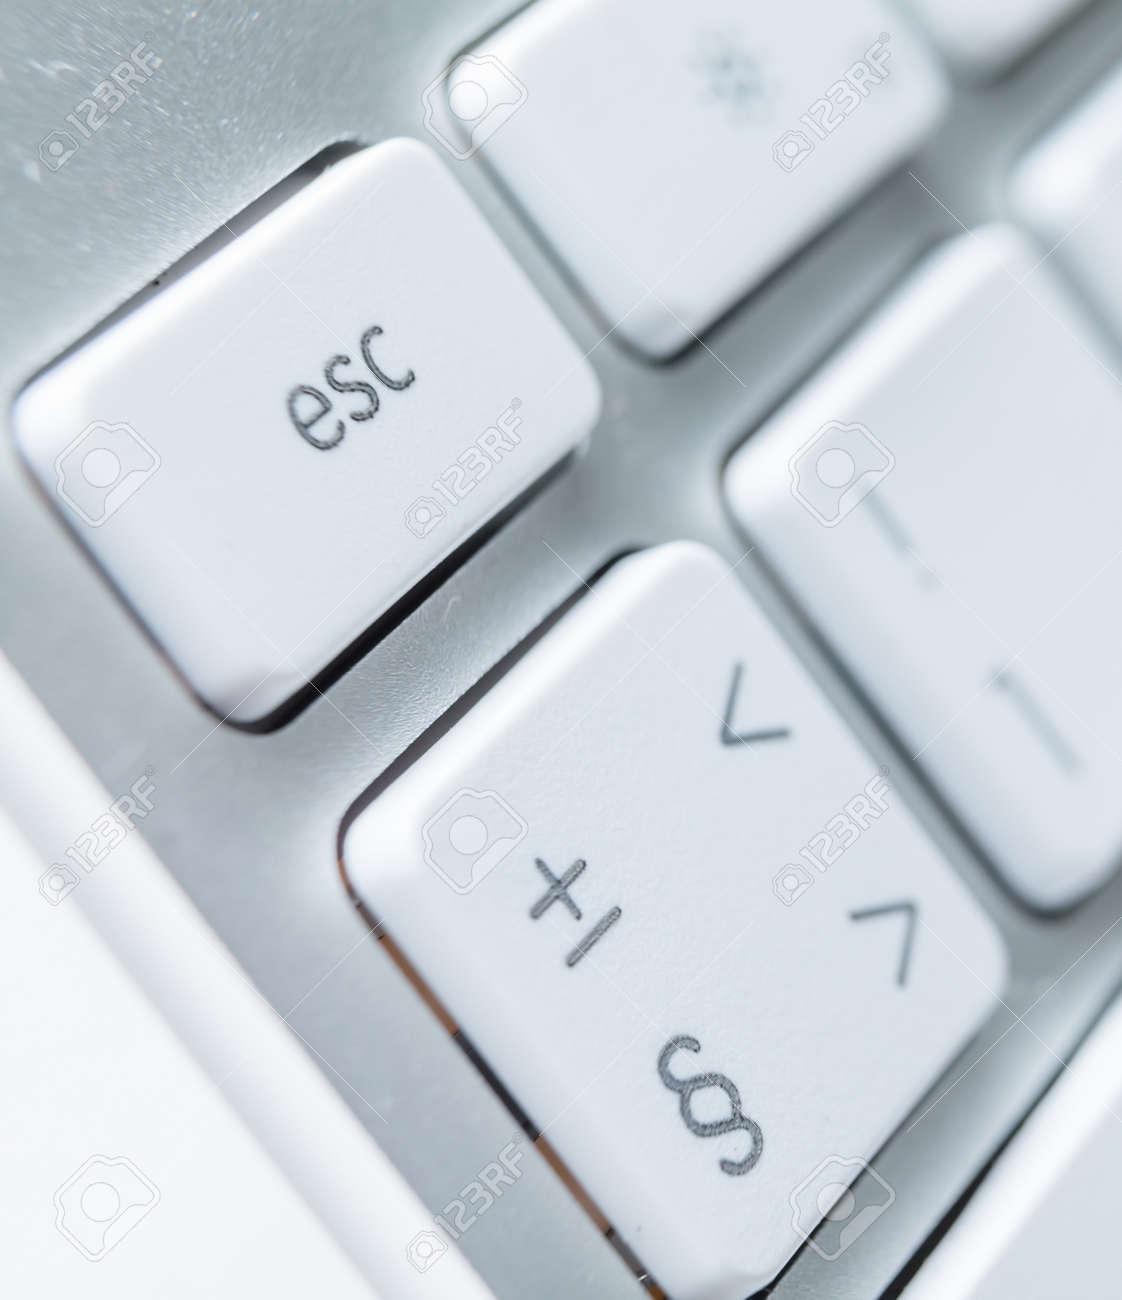 Close up of keys of white pc keyboard Stock Photo - 15873130